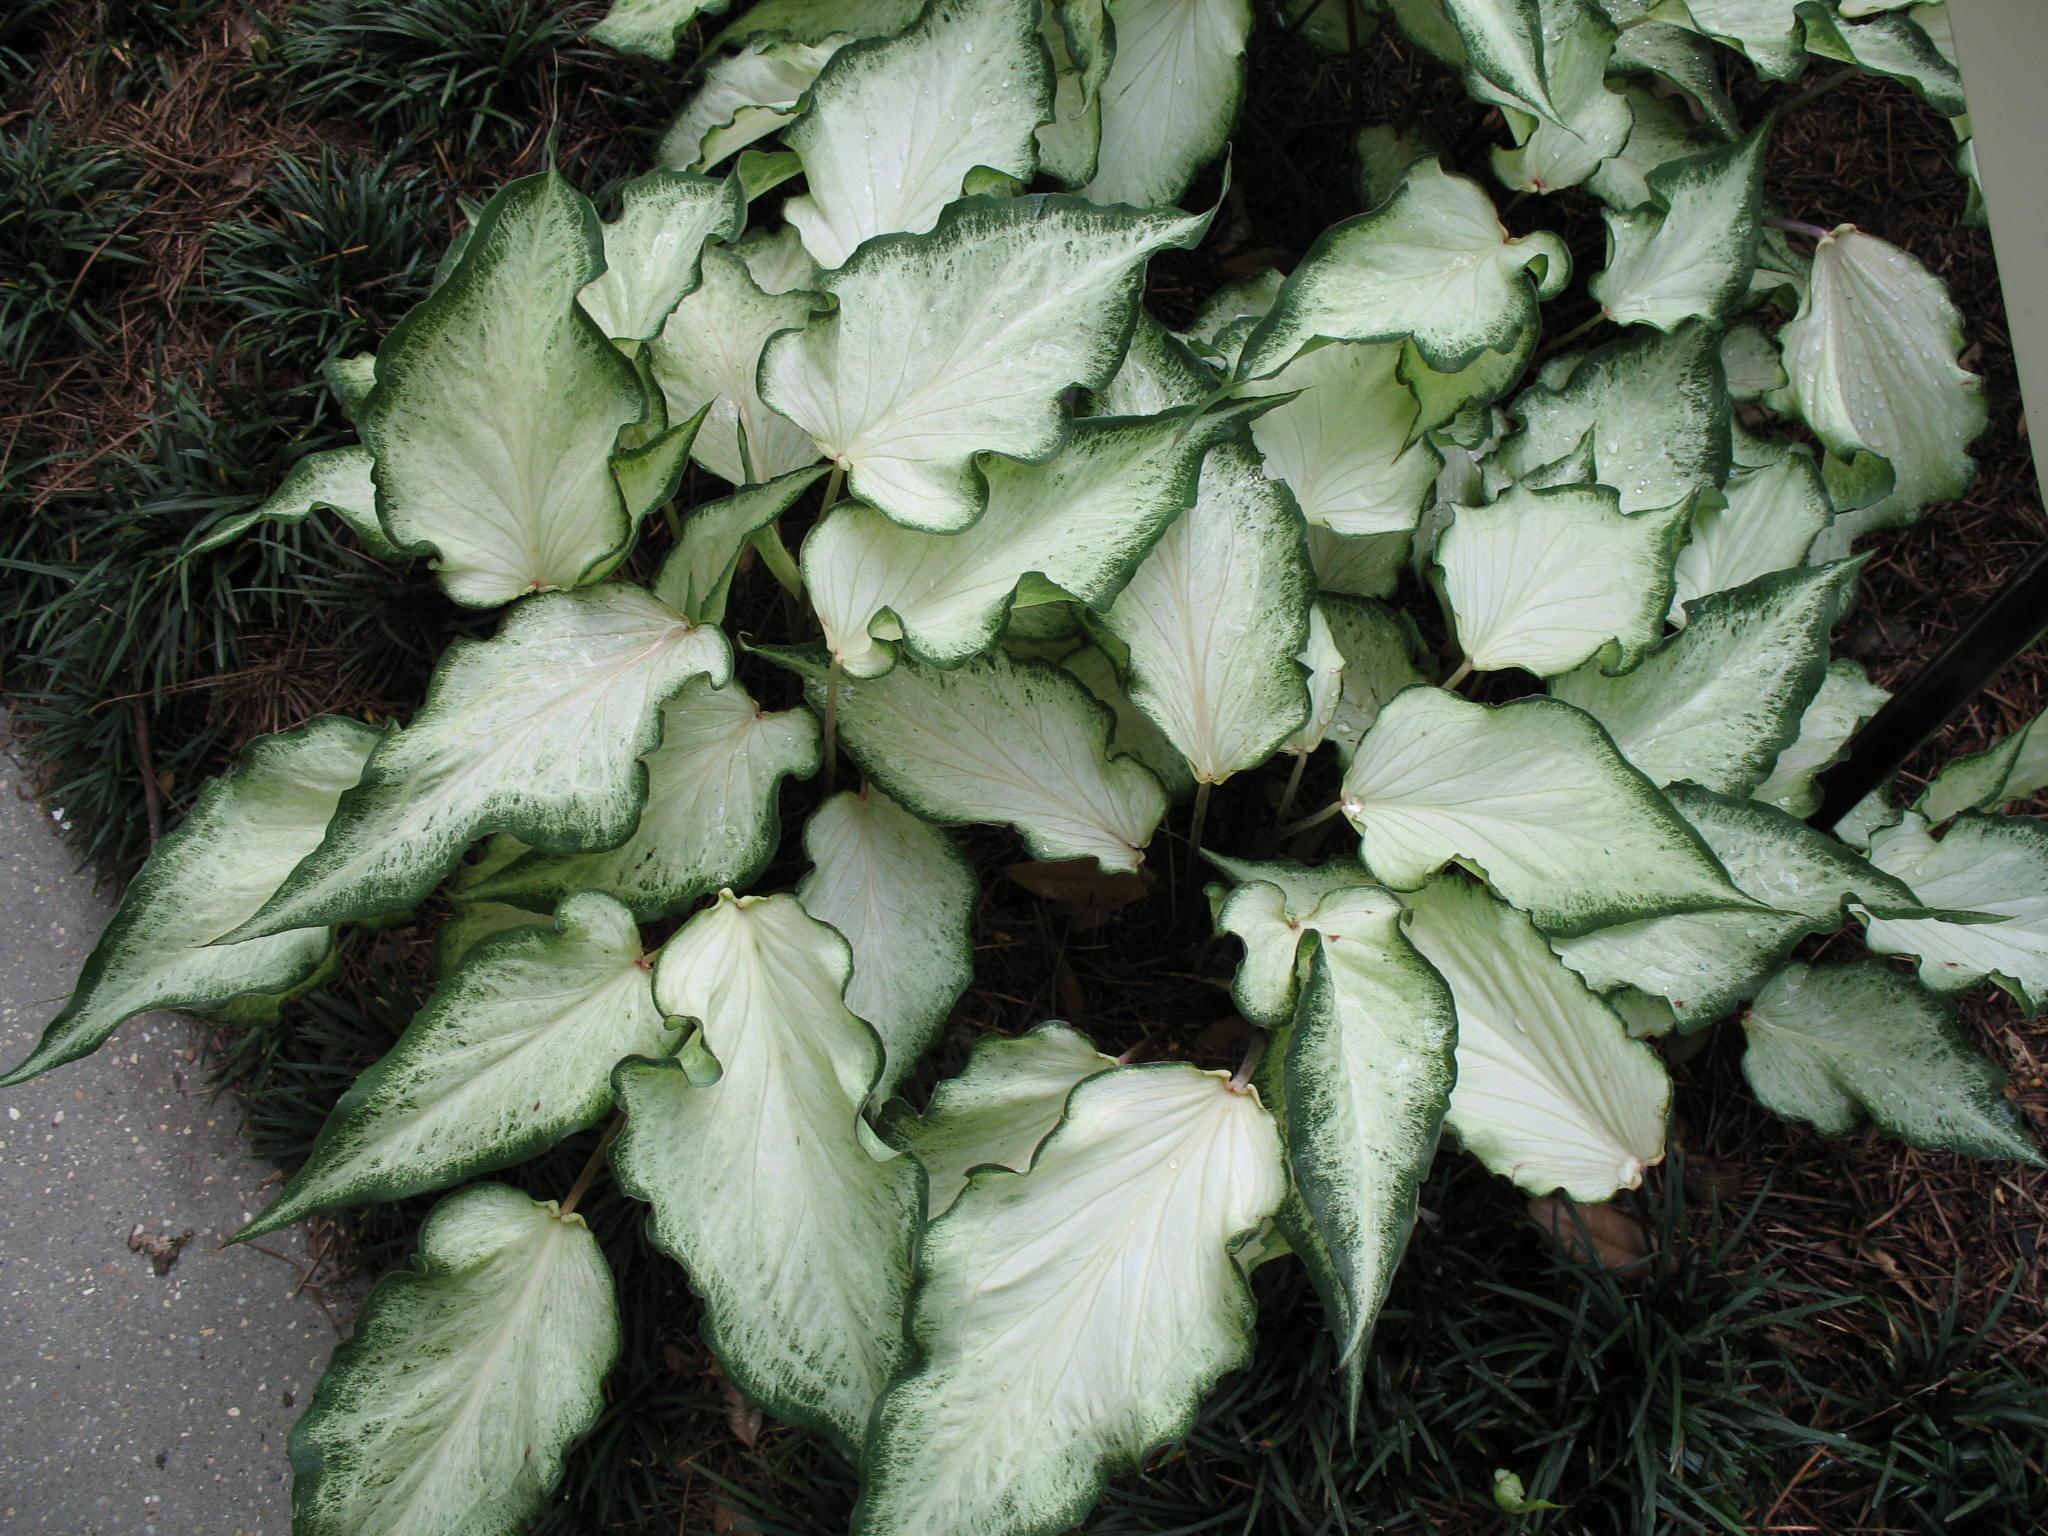 Caladium 'White Ruffles'  / Caladium 'White Ruffles'